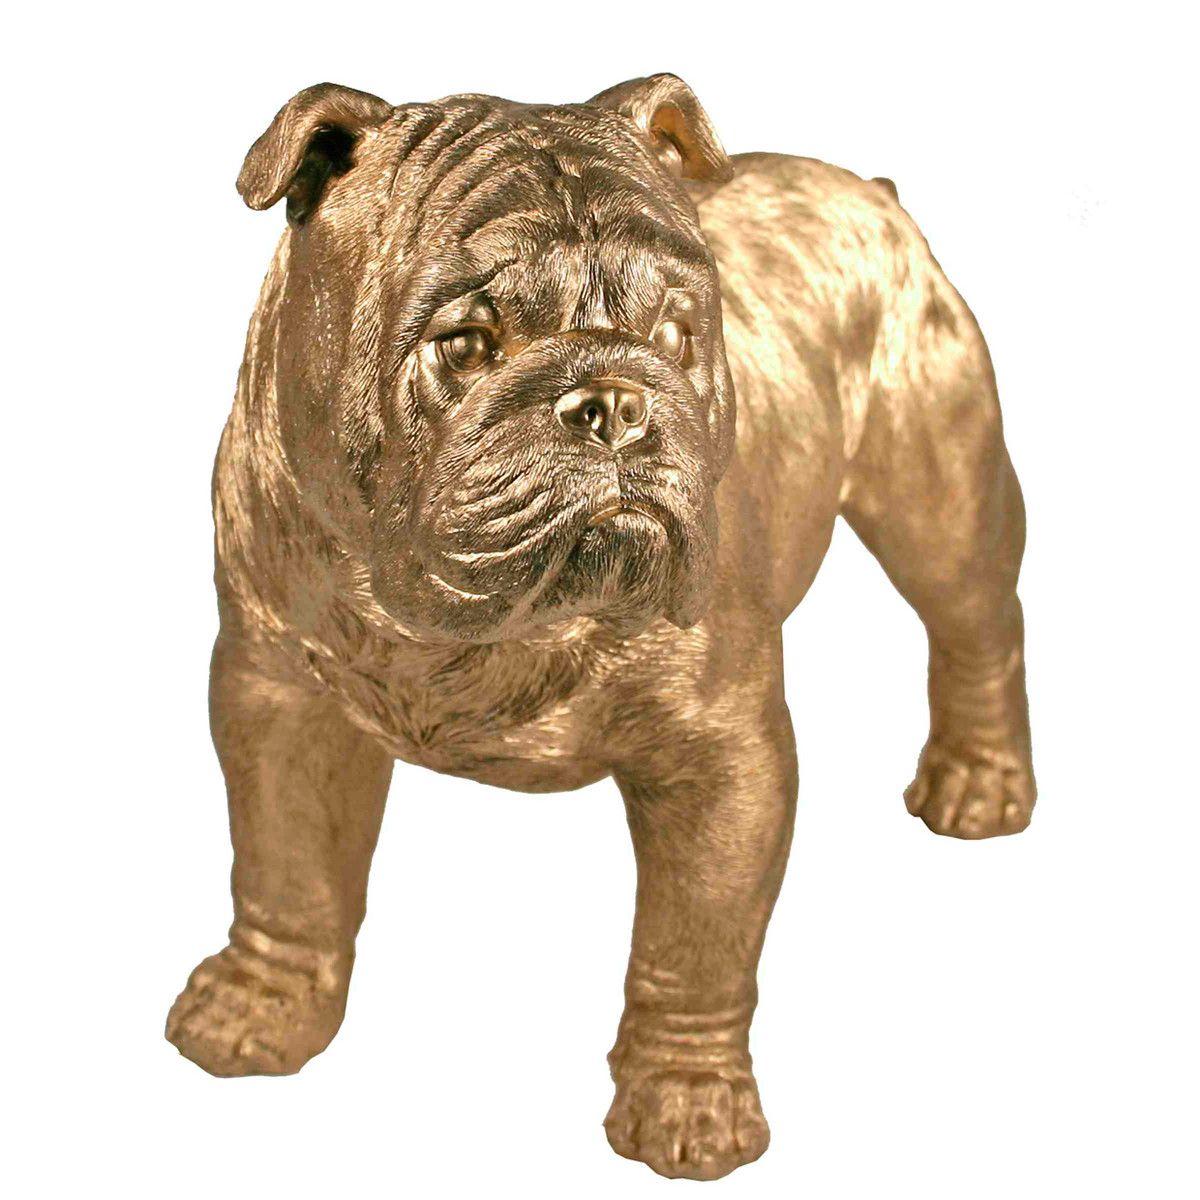 {Bulldog Shelf Decor} Karma Kiss - this is one seeriously cool lookin' bulldog